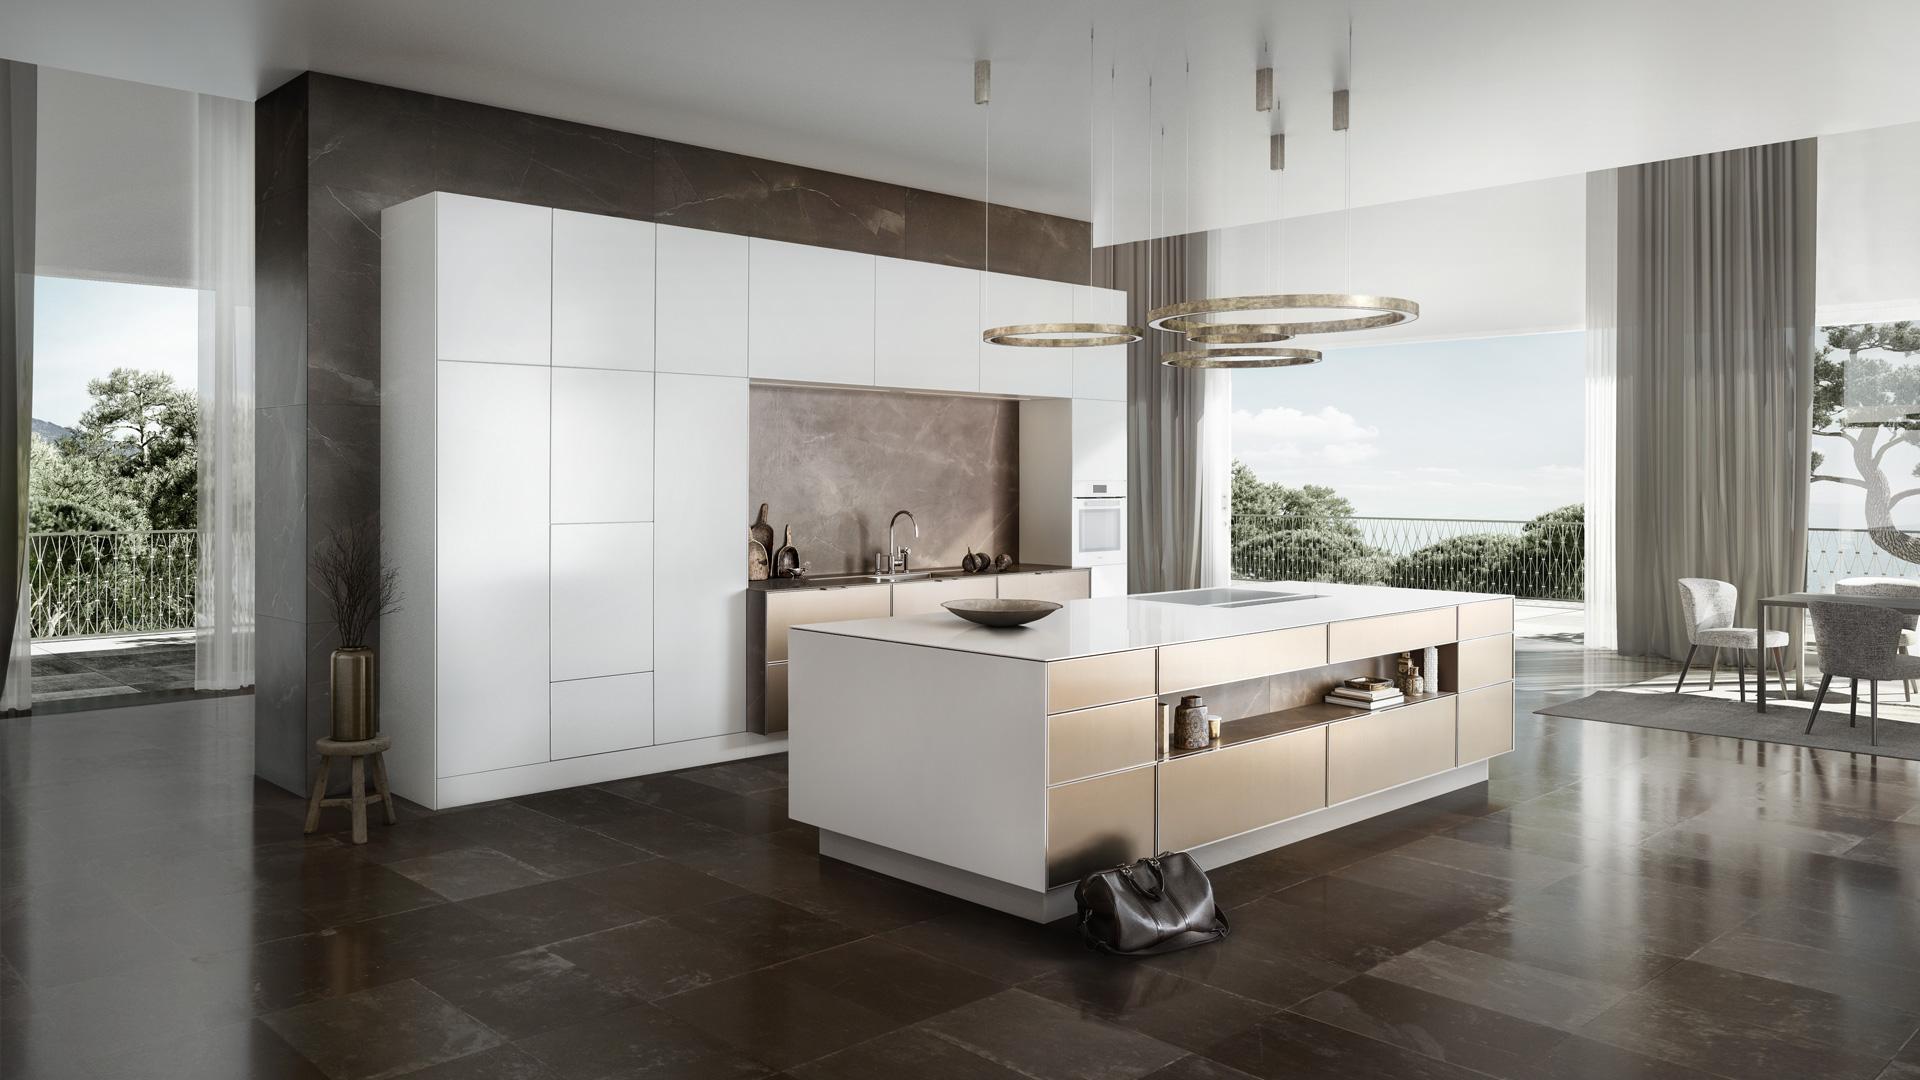 Kleine Keuken Kopen : Pure keuken ontwerpers oosterhout